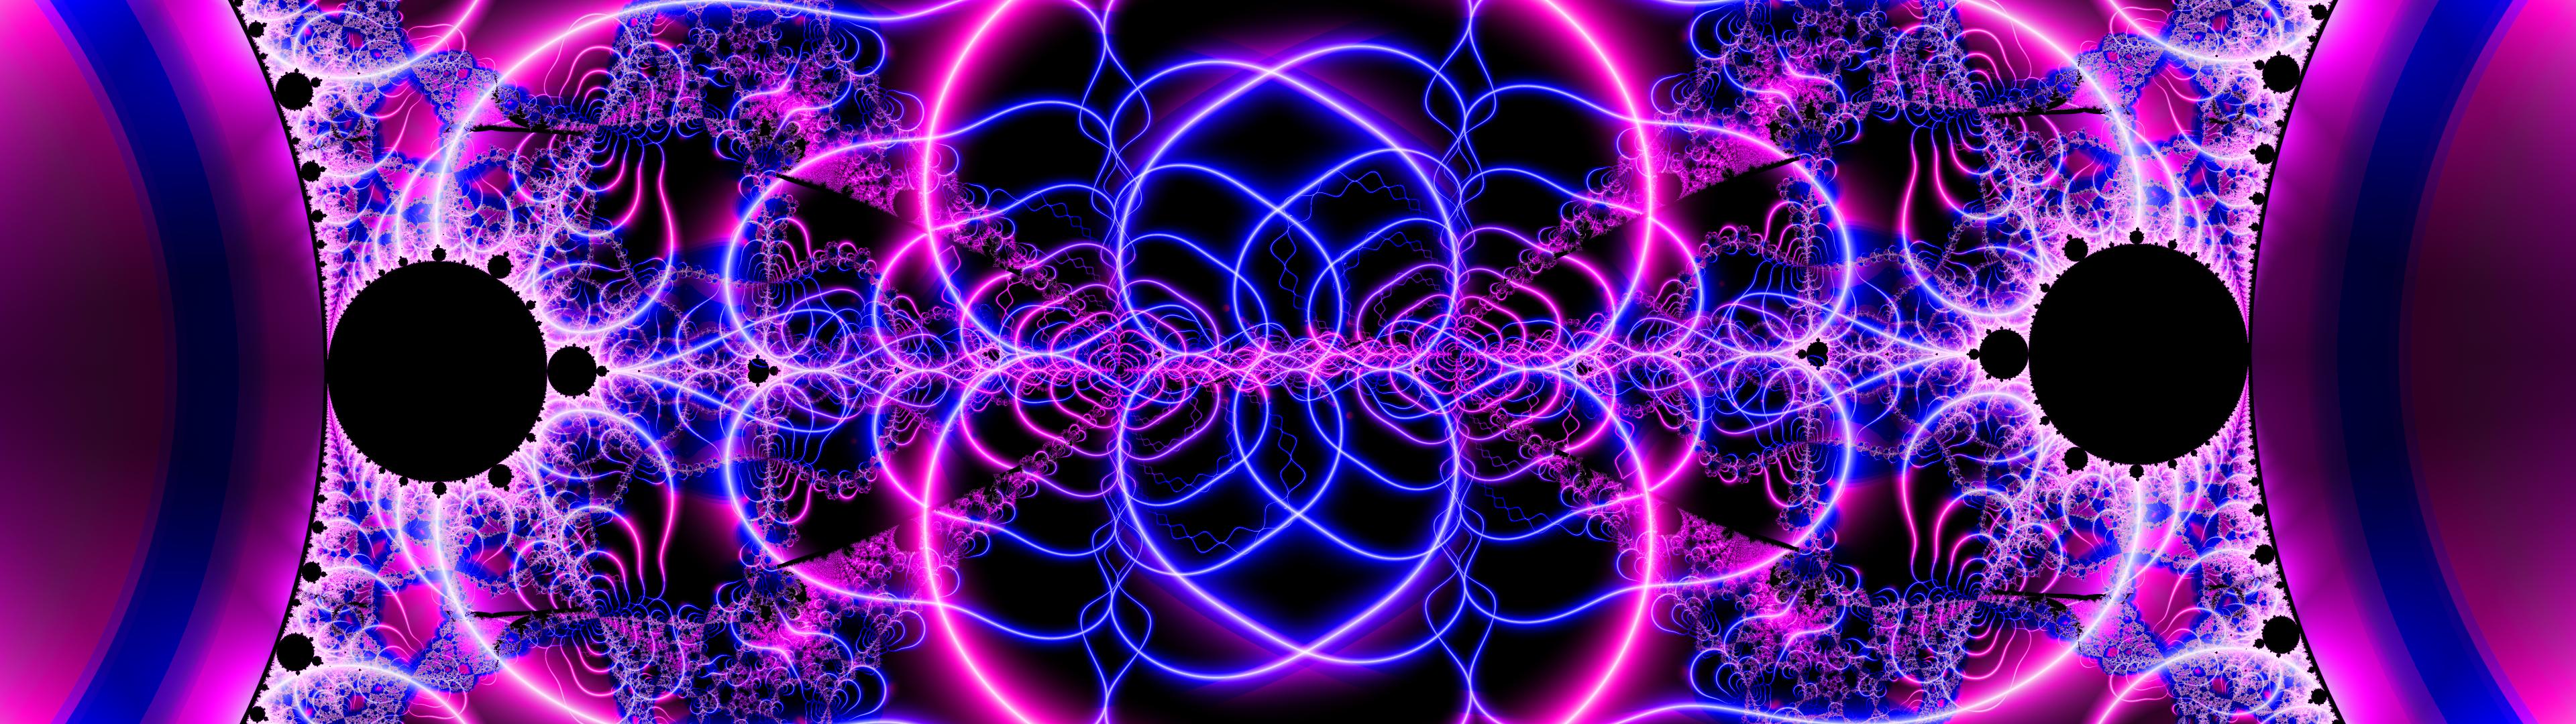 Pink Tentacle Rape 2   ultrawide by drdoom 3840x1080